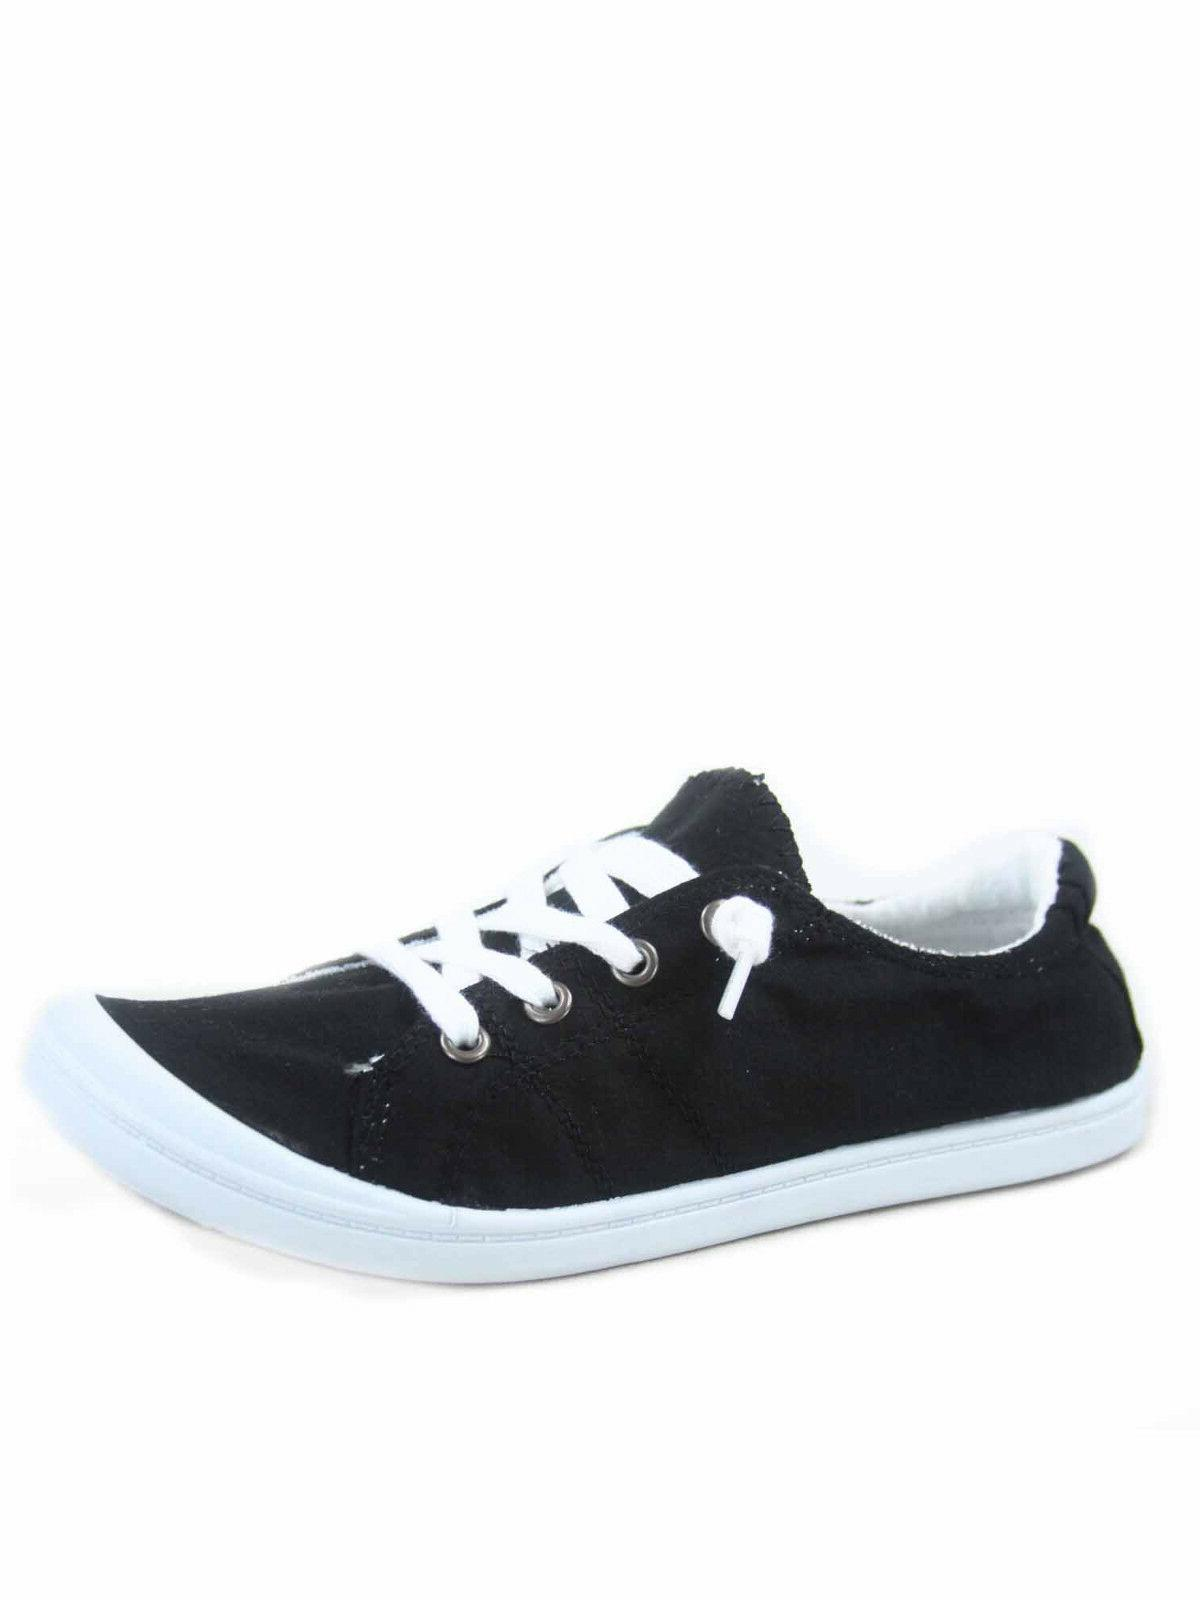 Women's Causal Slip Flat Sneaker 5.5